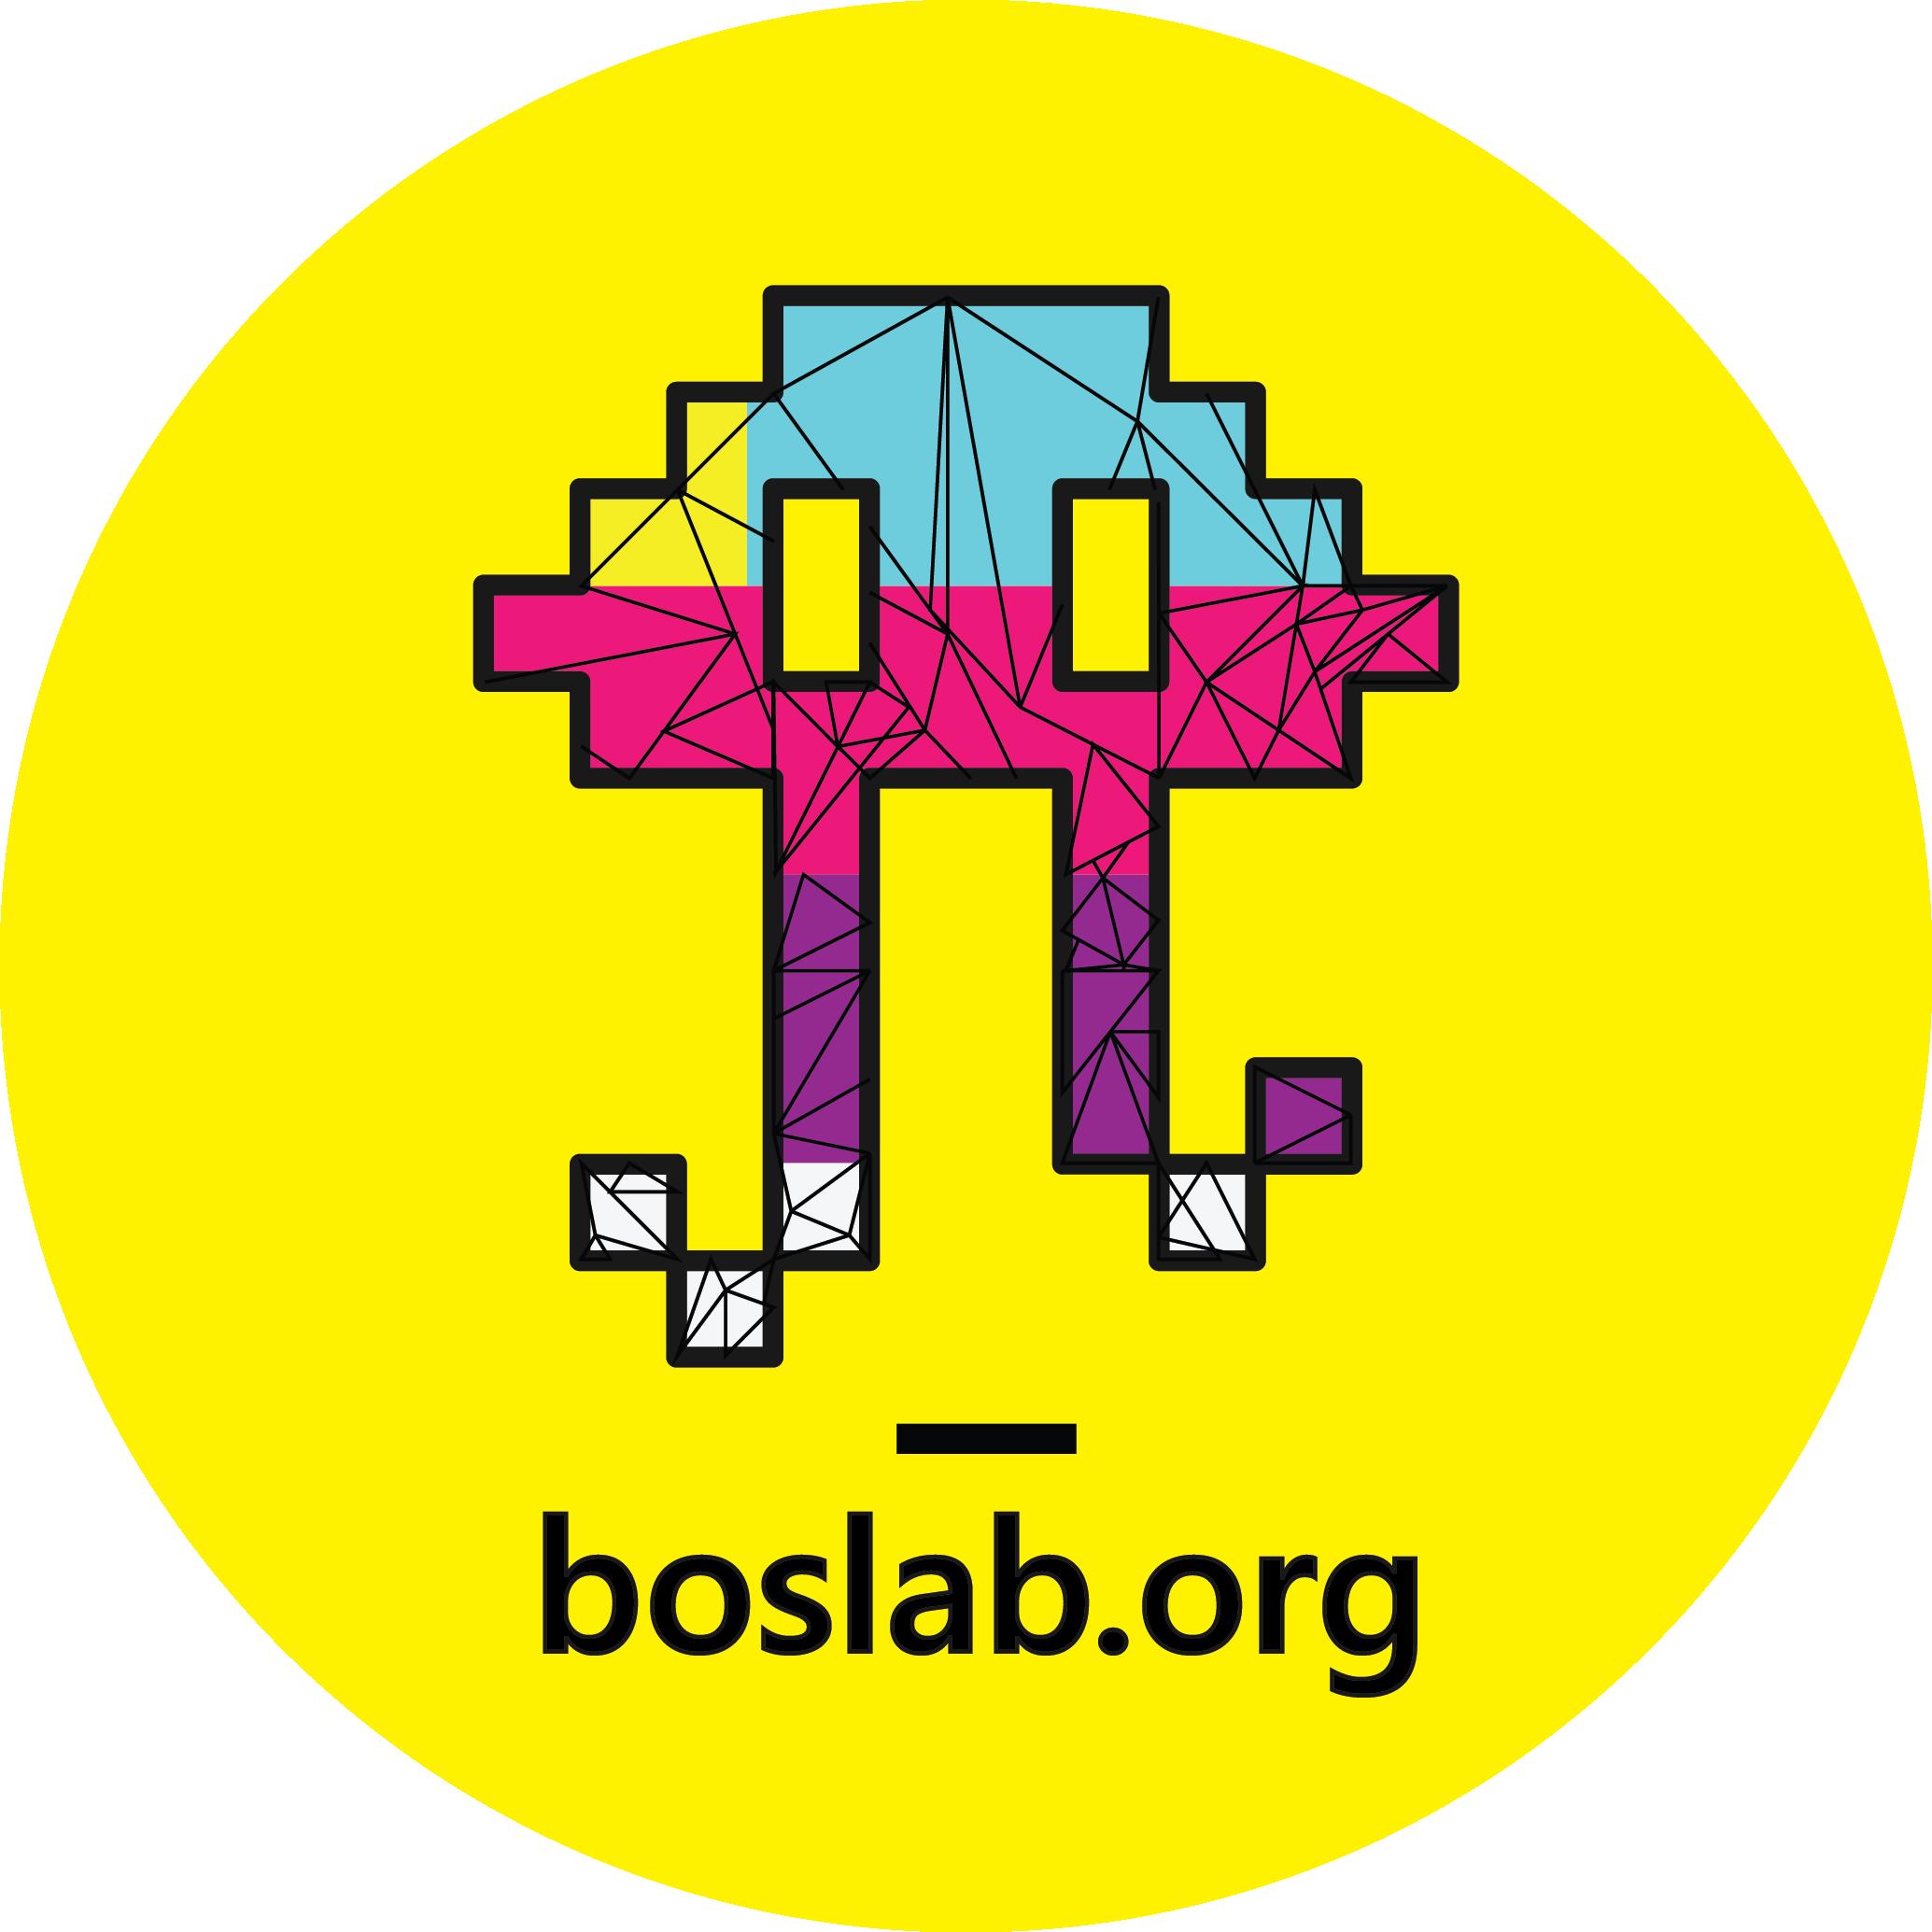 BosLab-logo-stickers-lower-case-larger-font